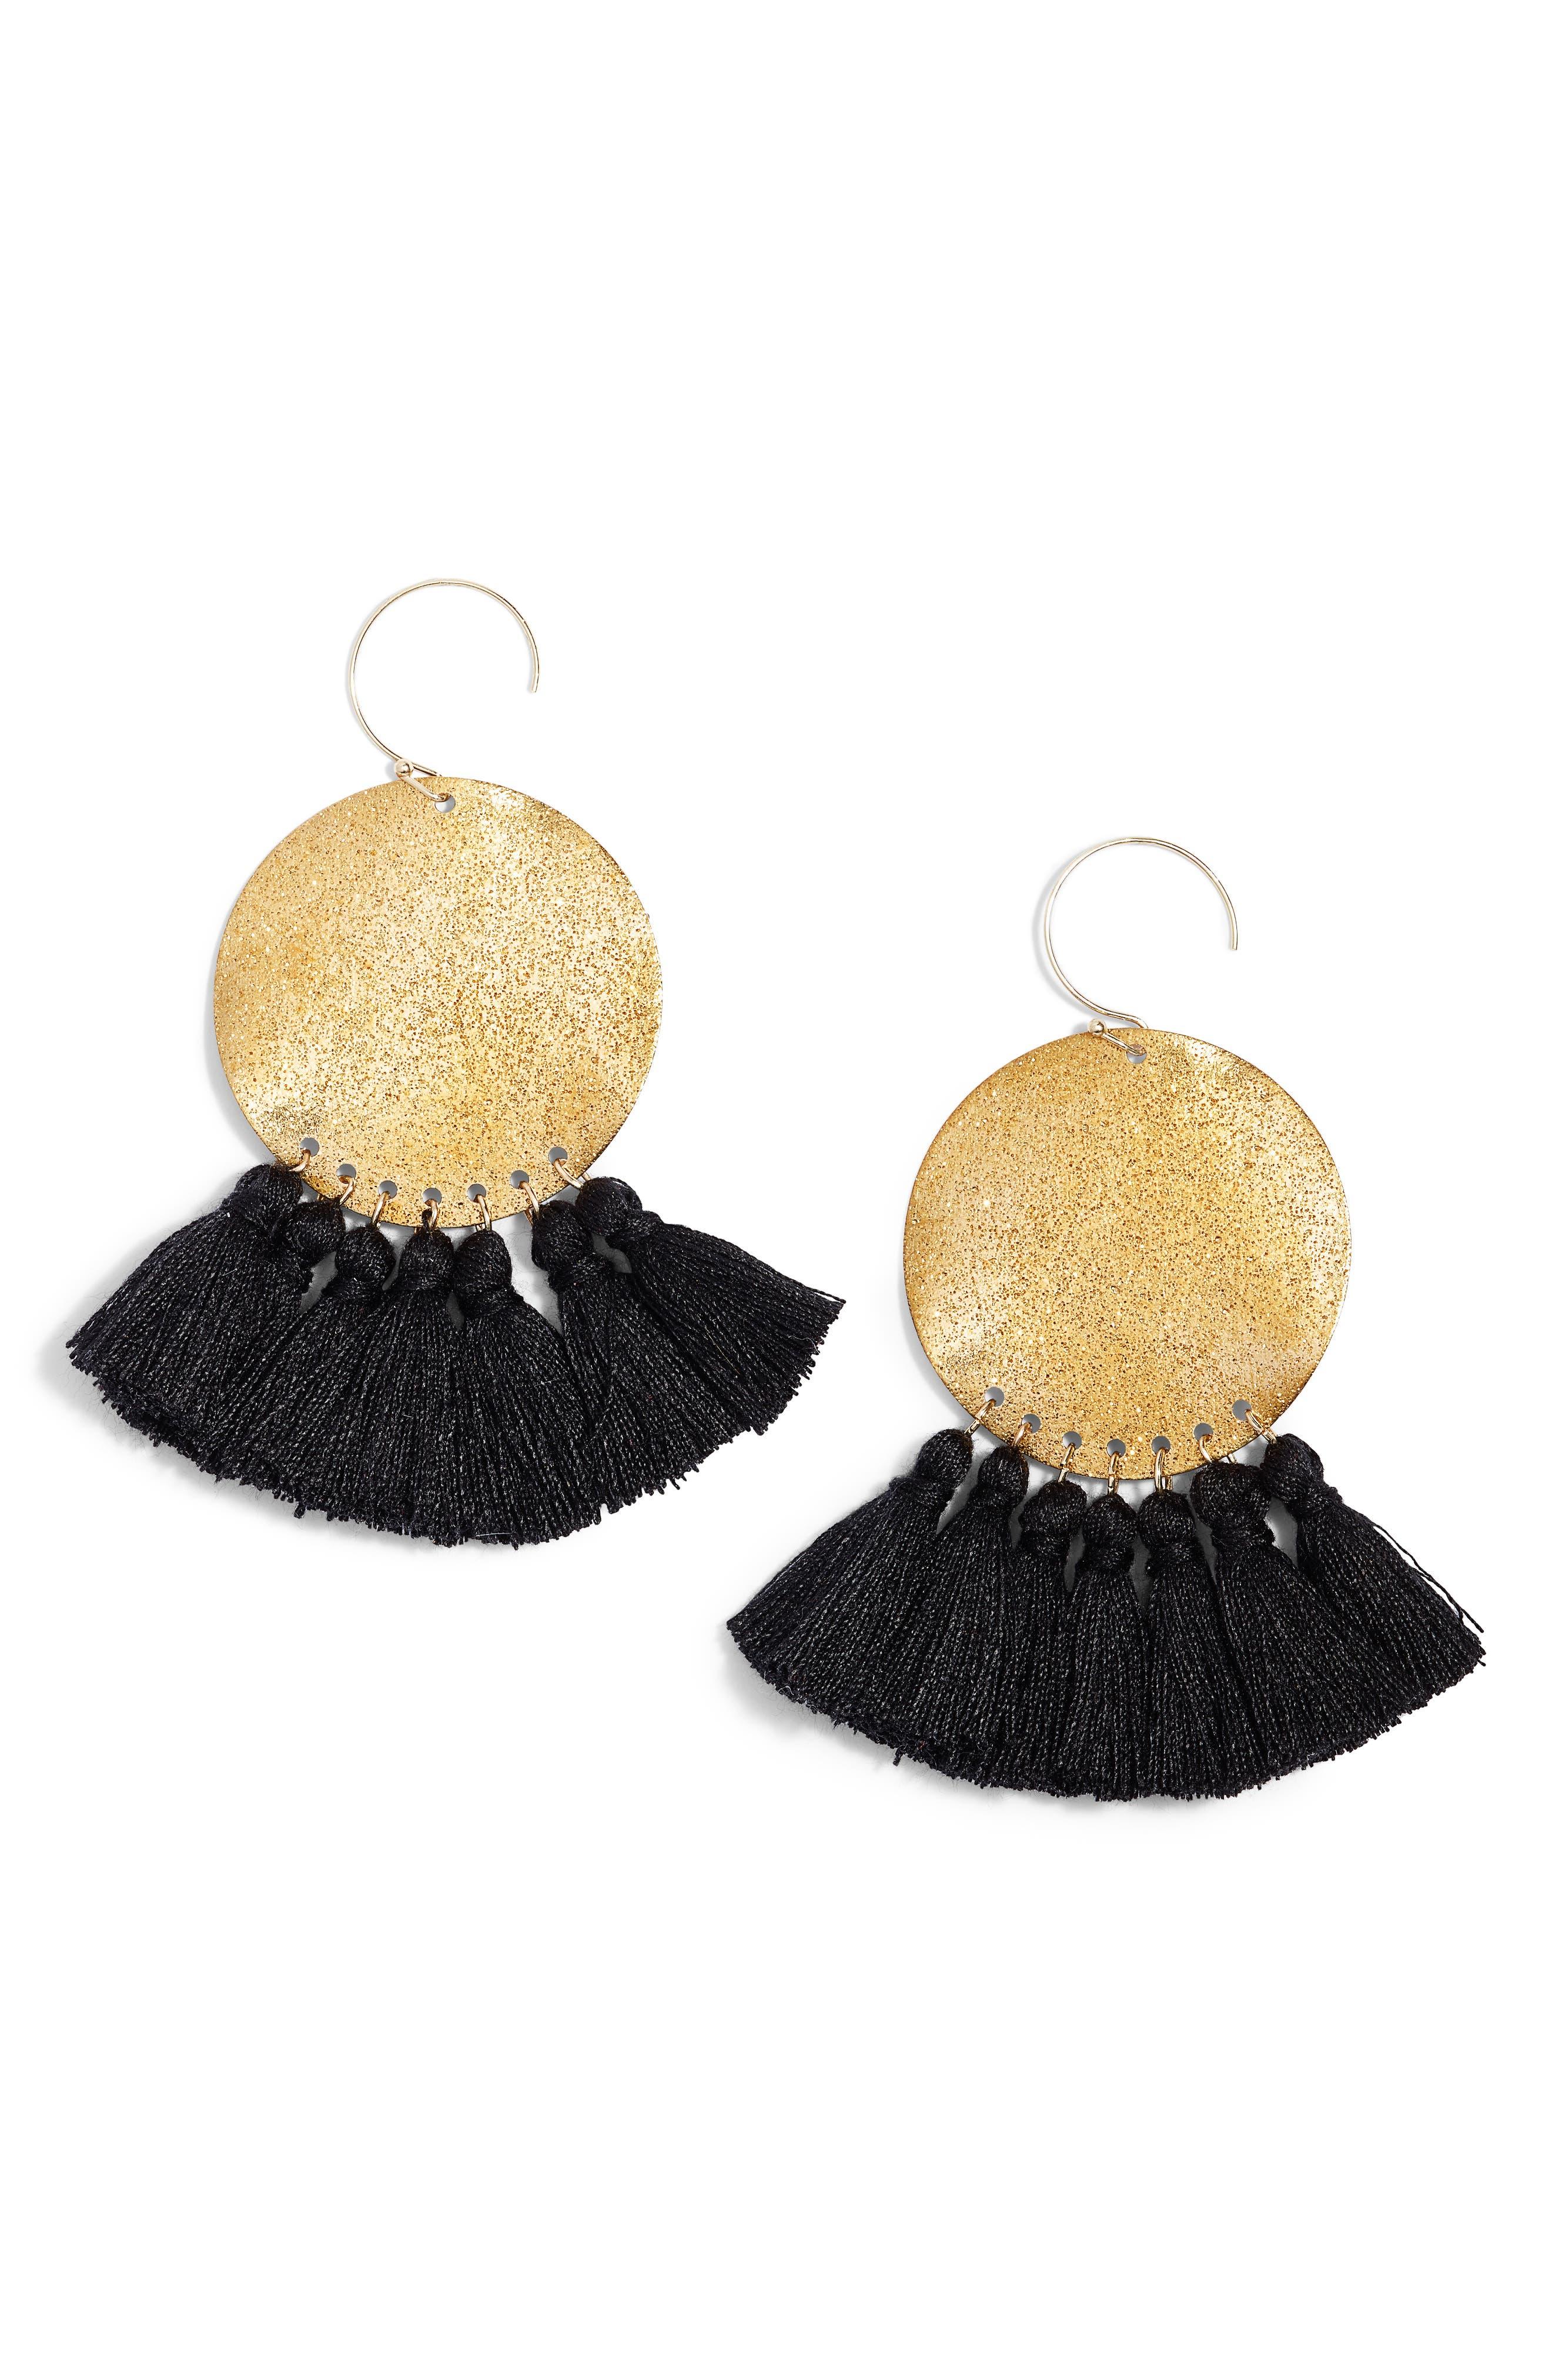 Lunar Tassel Earrings,                         Main,                         color, 710